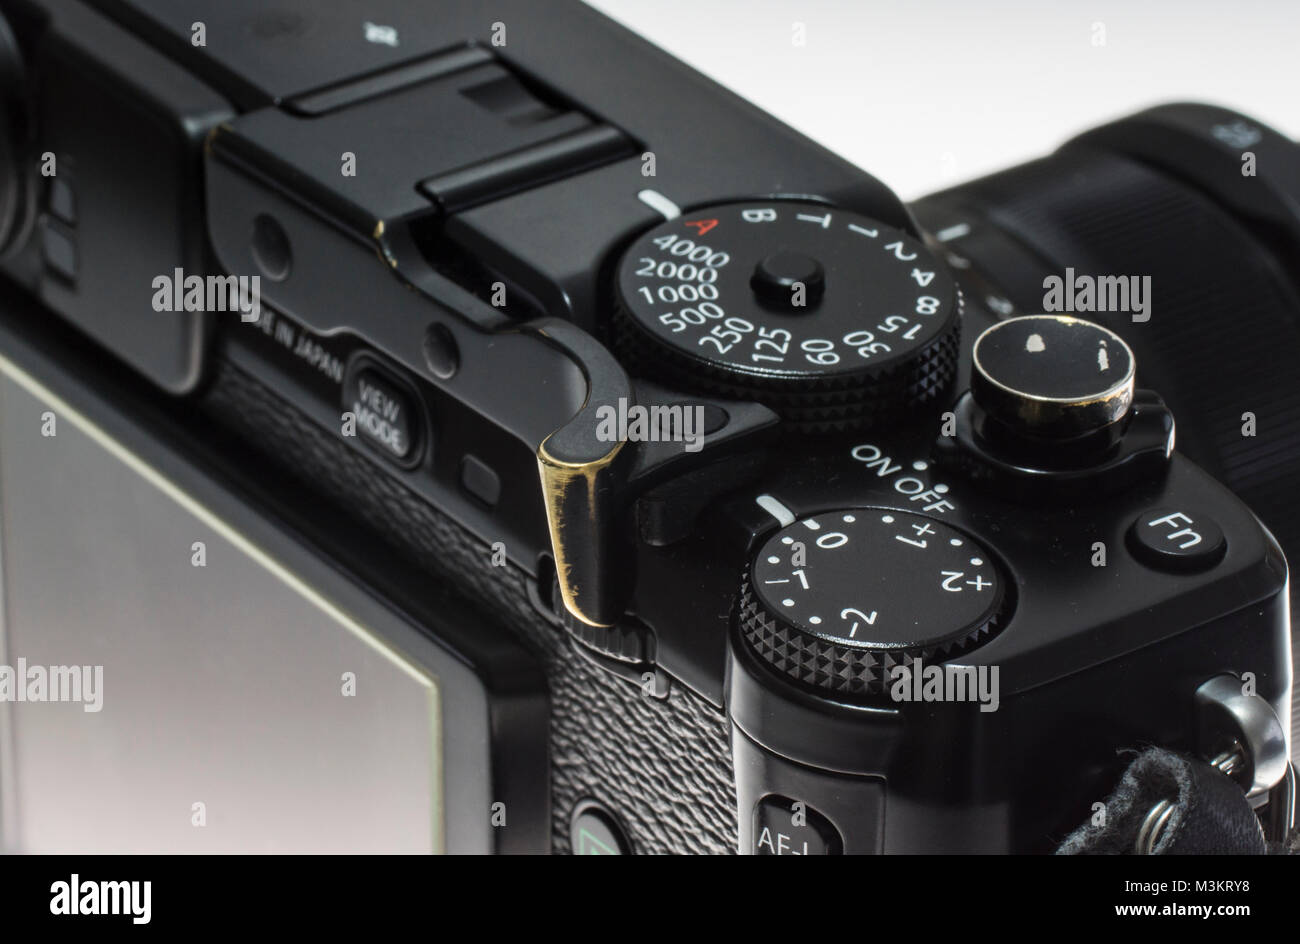 A cusomised fujifilm X Pro-1 digital camera - Stock Image